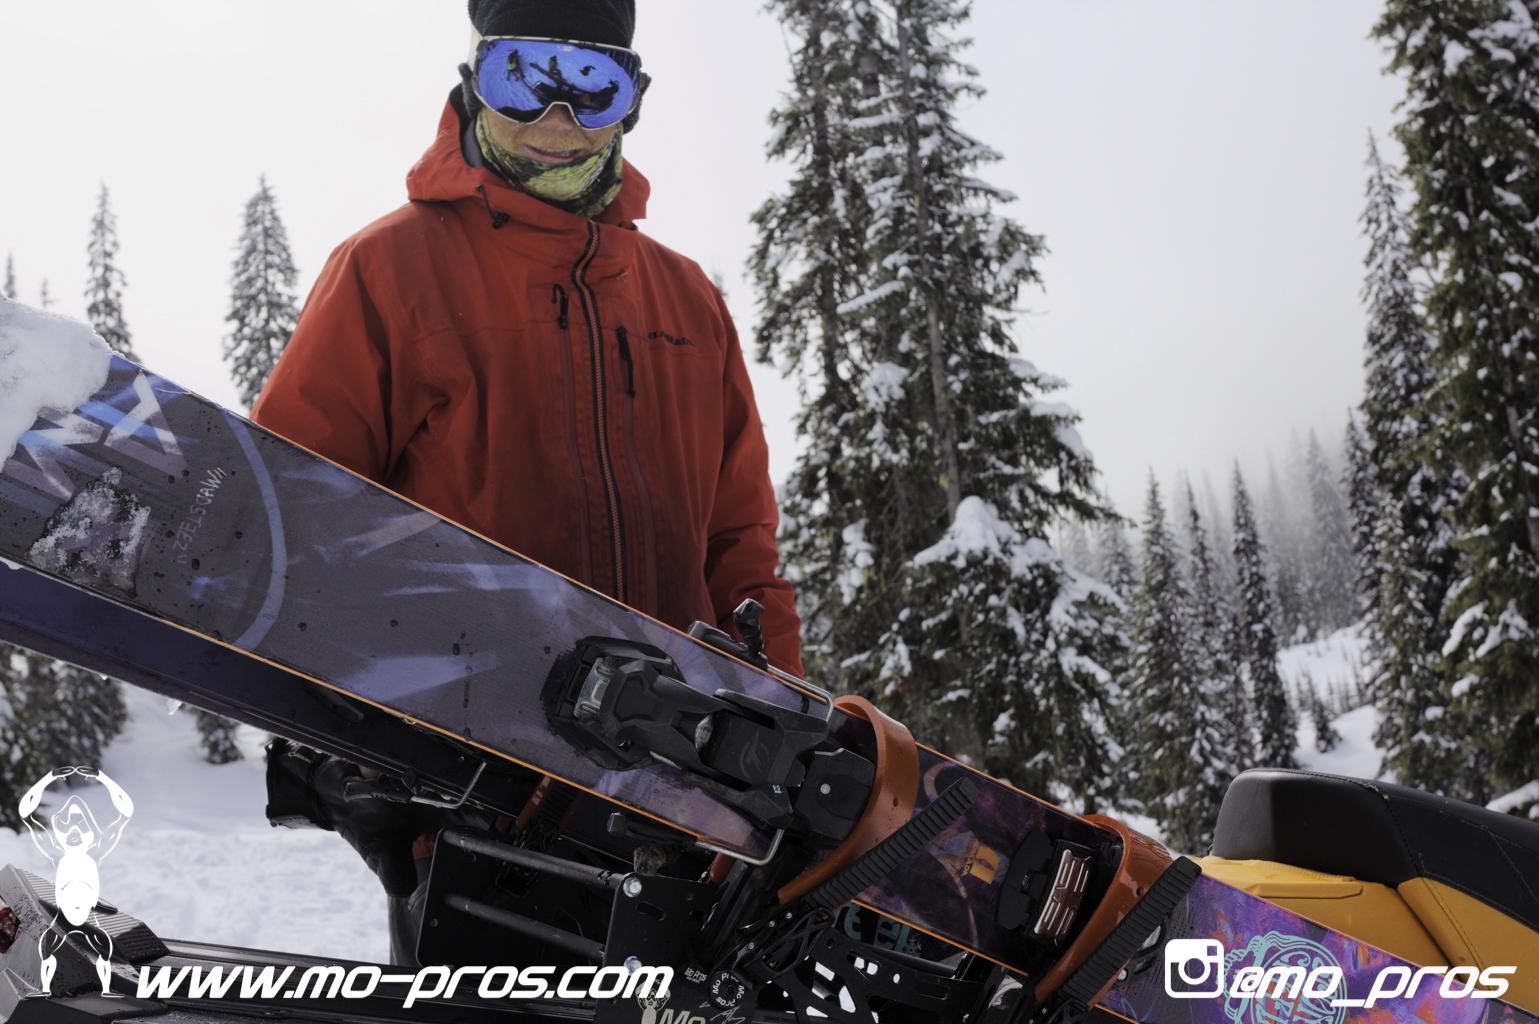 14_Backcountry _Backcountry United_Rack_Ski_Snowbike_Timbersled Rack_Tsaina Rack_CFR rack_Cheetah Factory Racing_gas Rack_Gear_Gun Rack_LinQ Snowboard Ski_Snowboard rack_snowboard_Snowboarding_snowmo.jpg